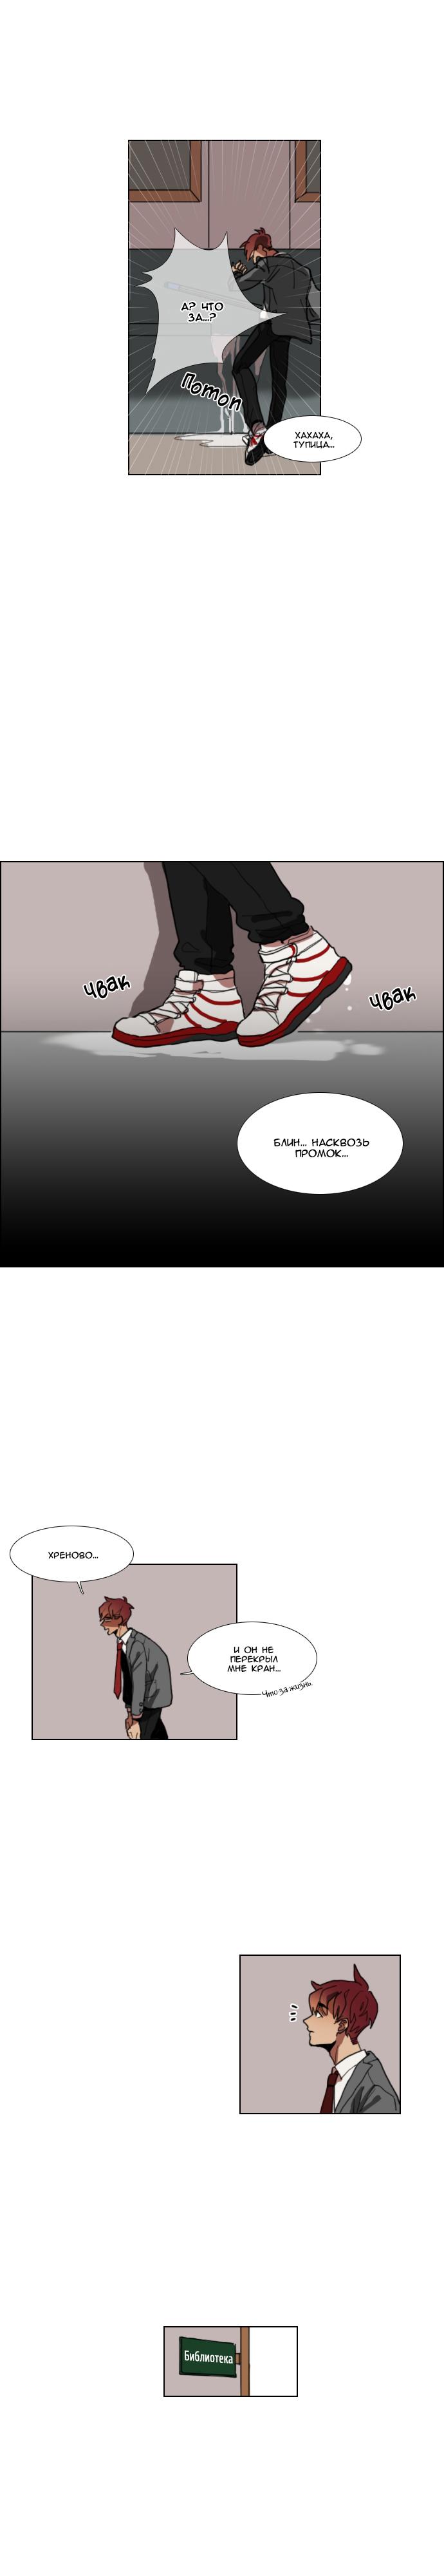 https://r1.ninemanga.com/comics/pic2/27/31131/325920/1496560540651.jpg Page 4